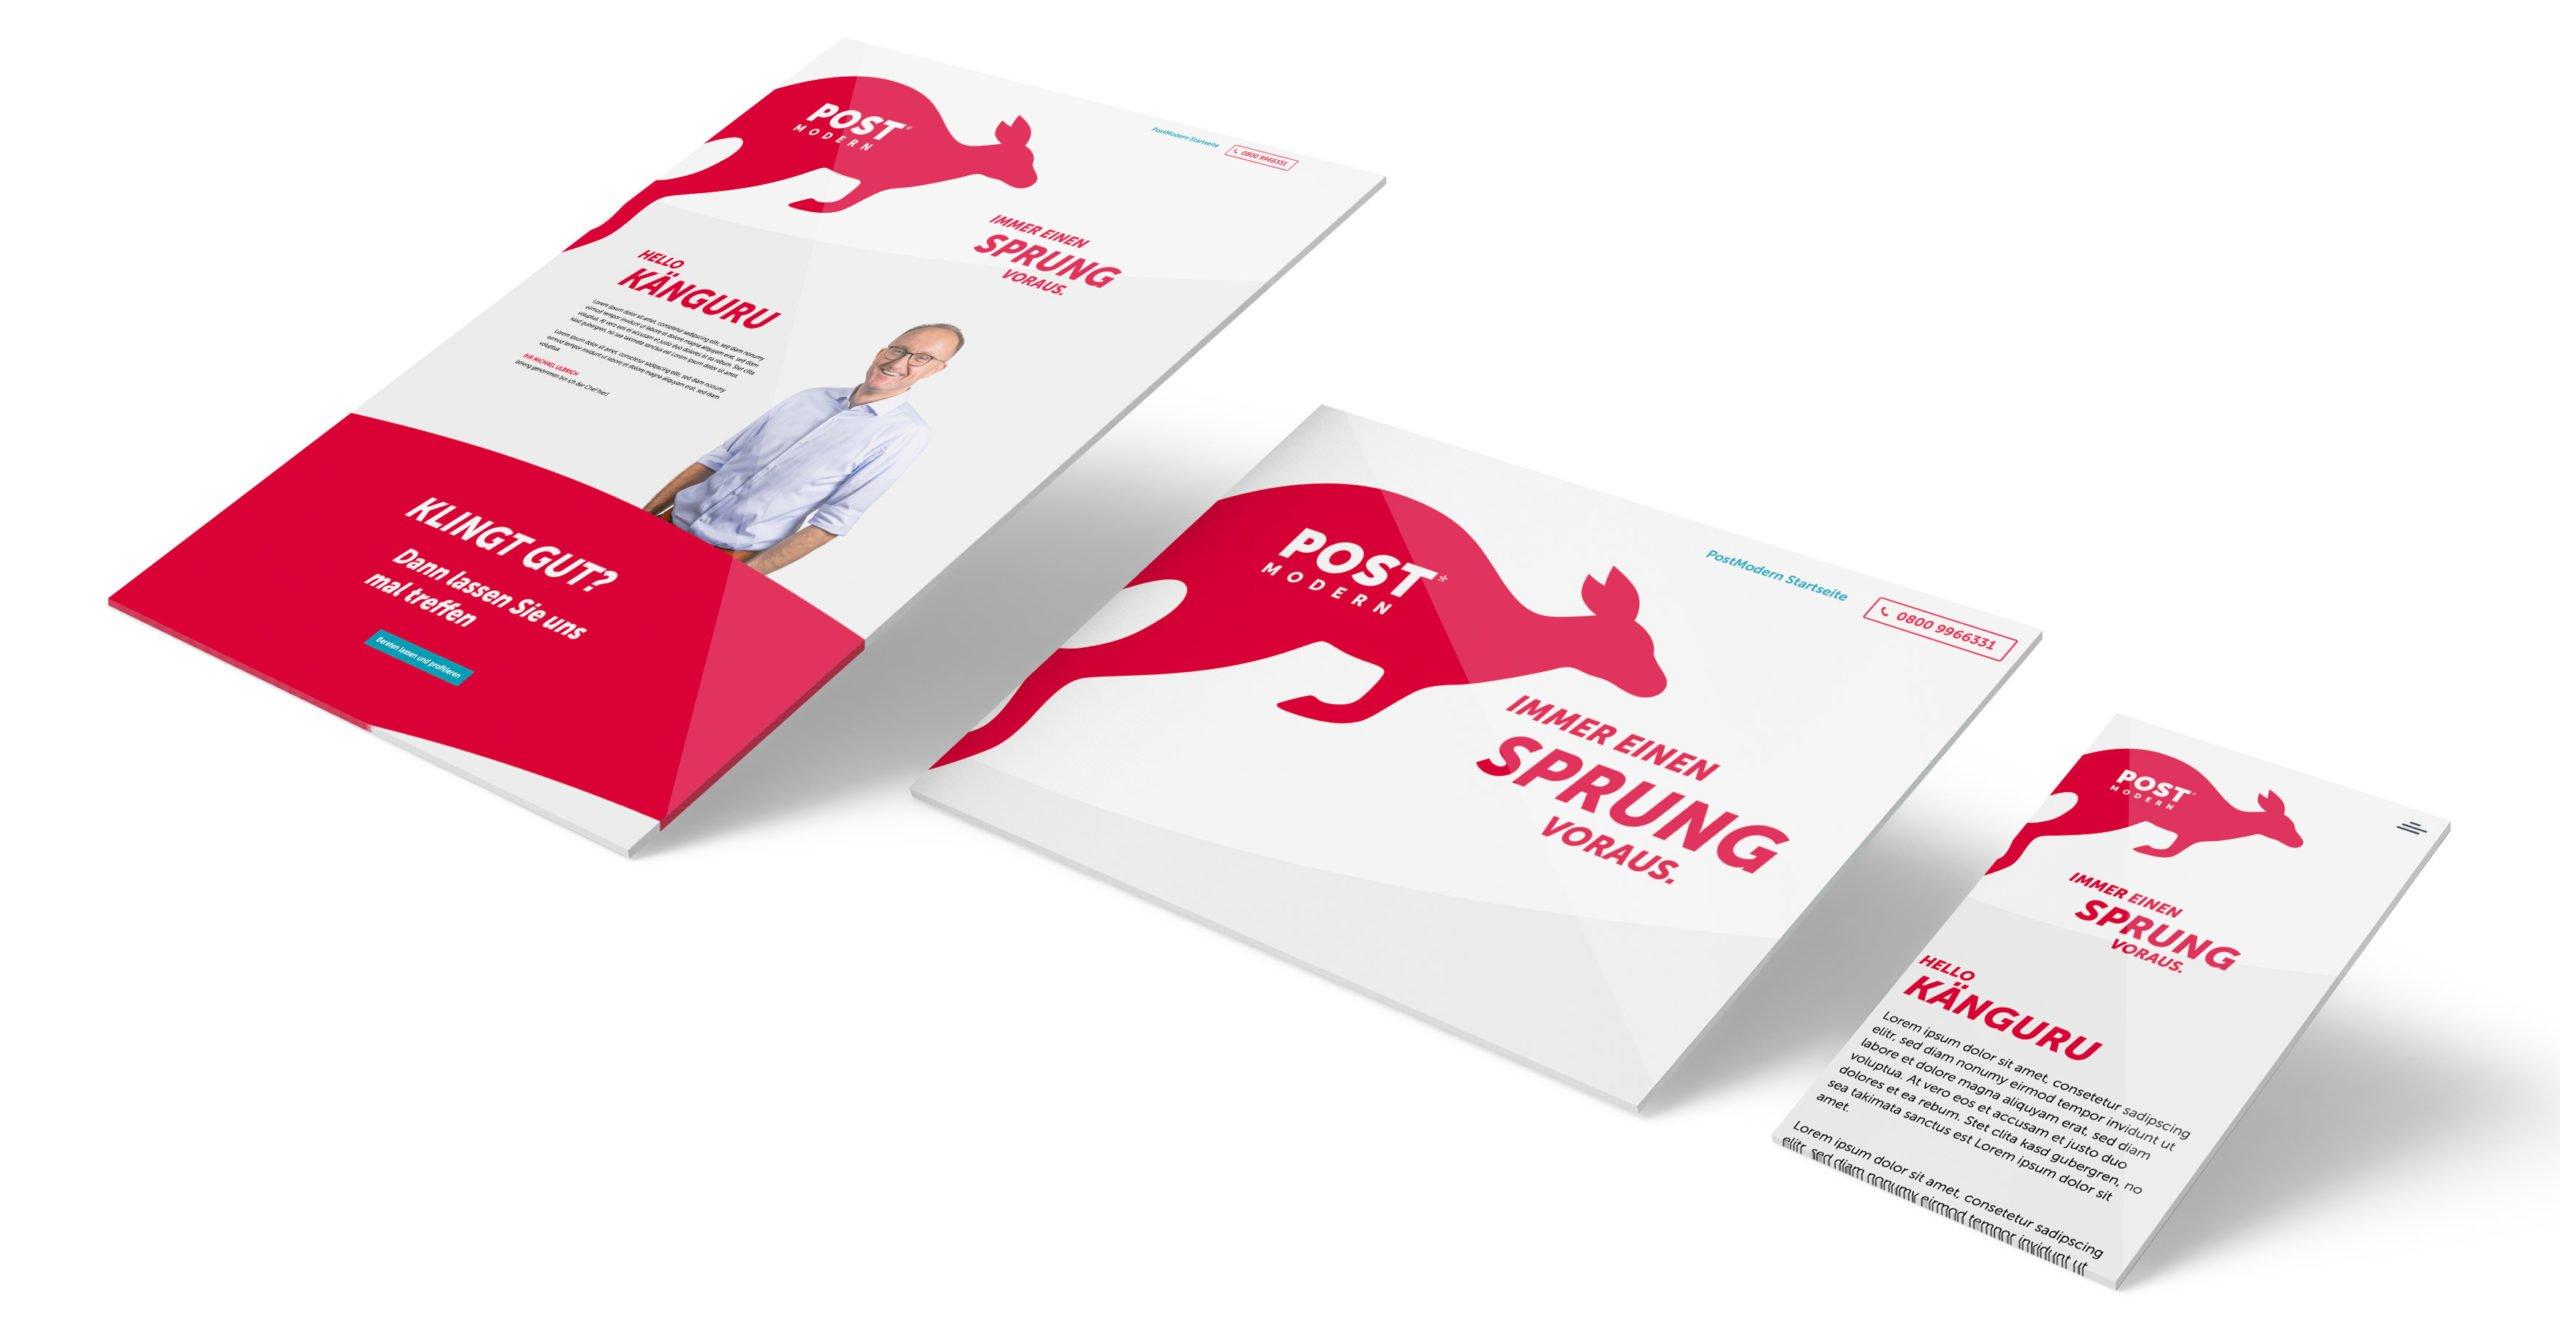 PostModern Markenerlaunch Känguru Landingpage mit WordPress